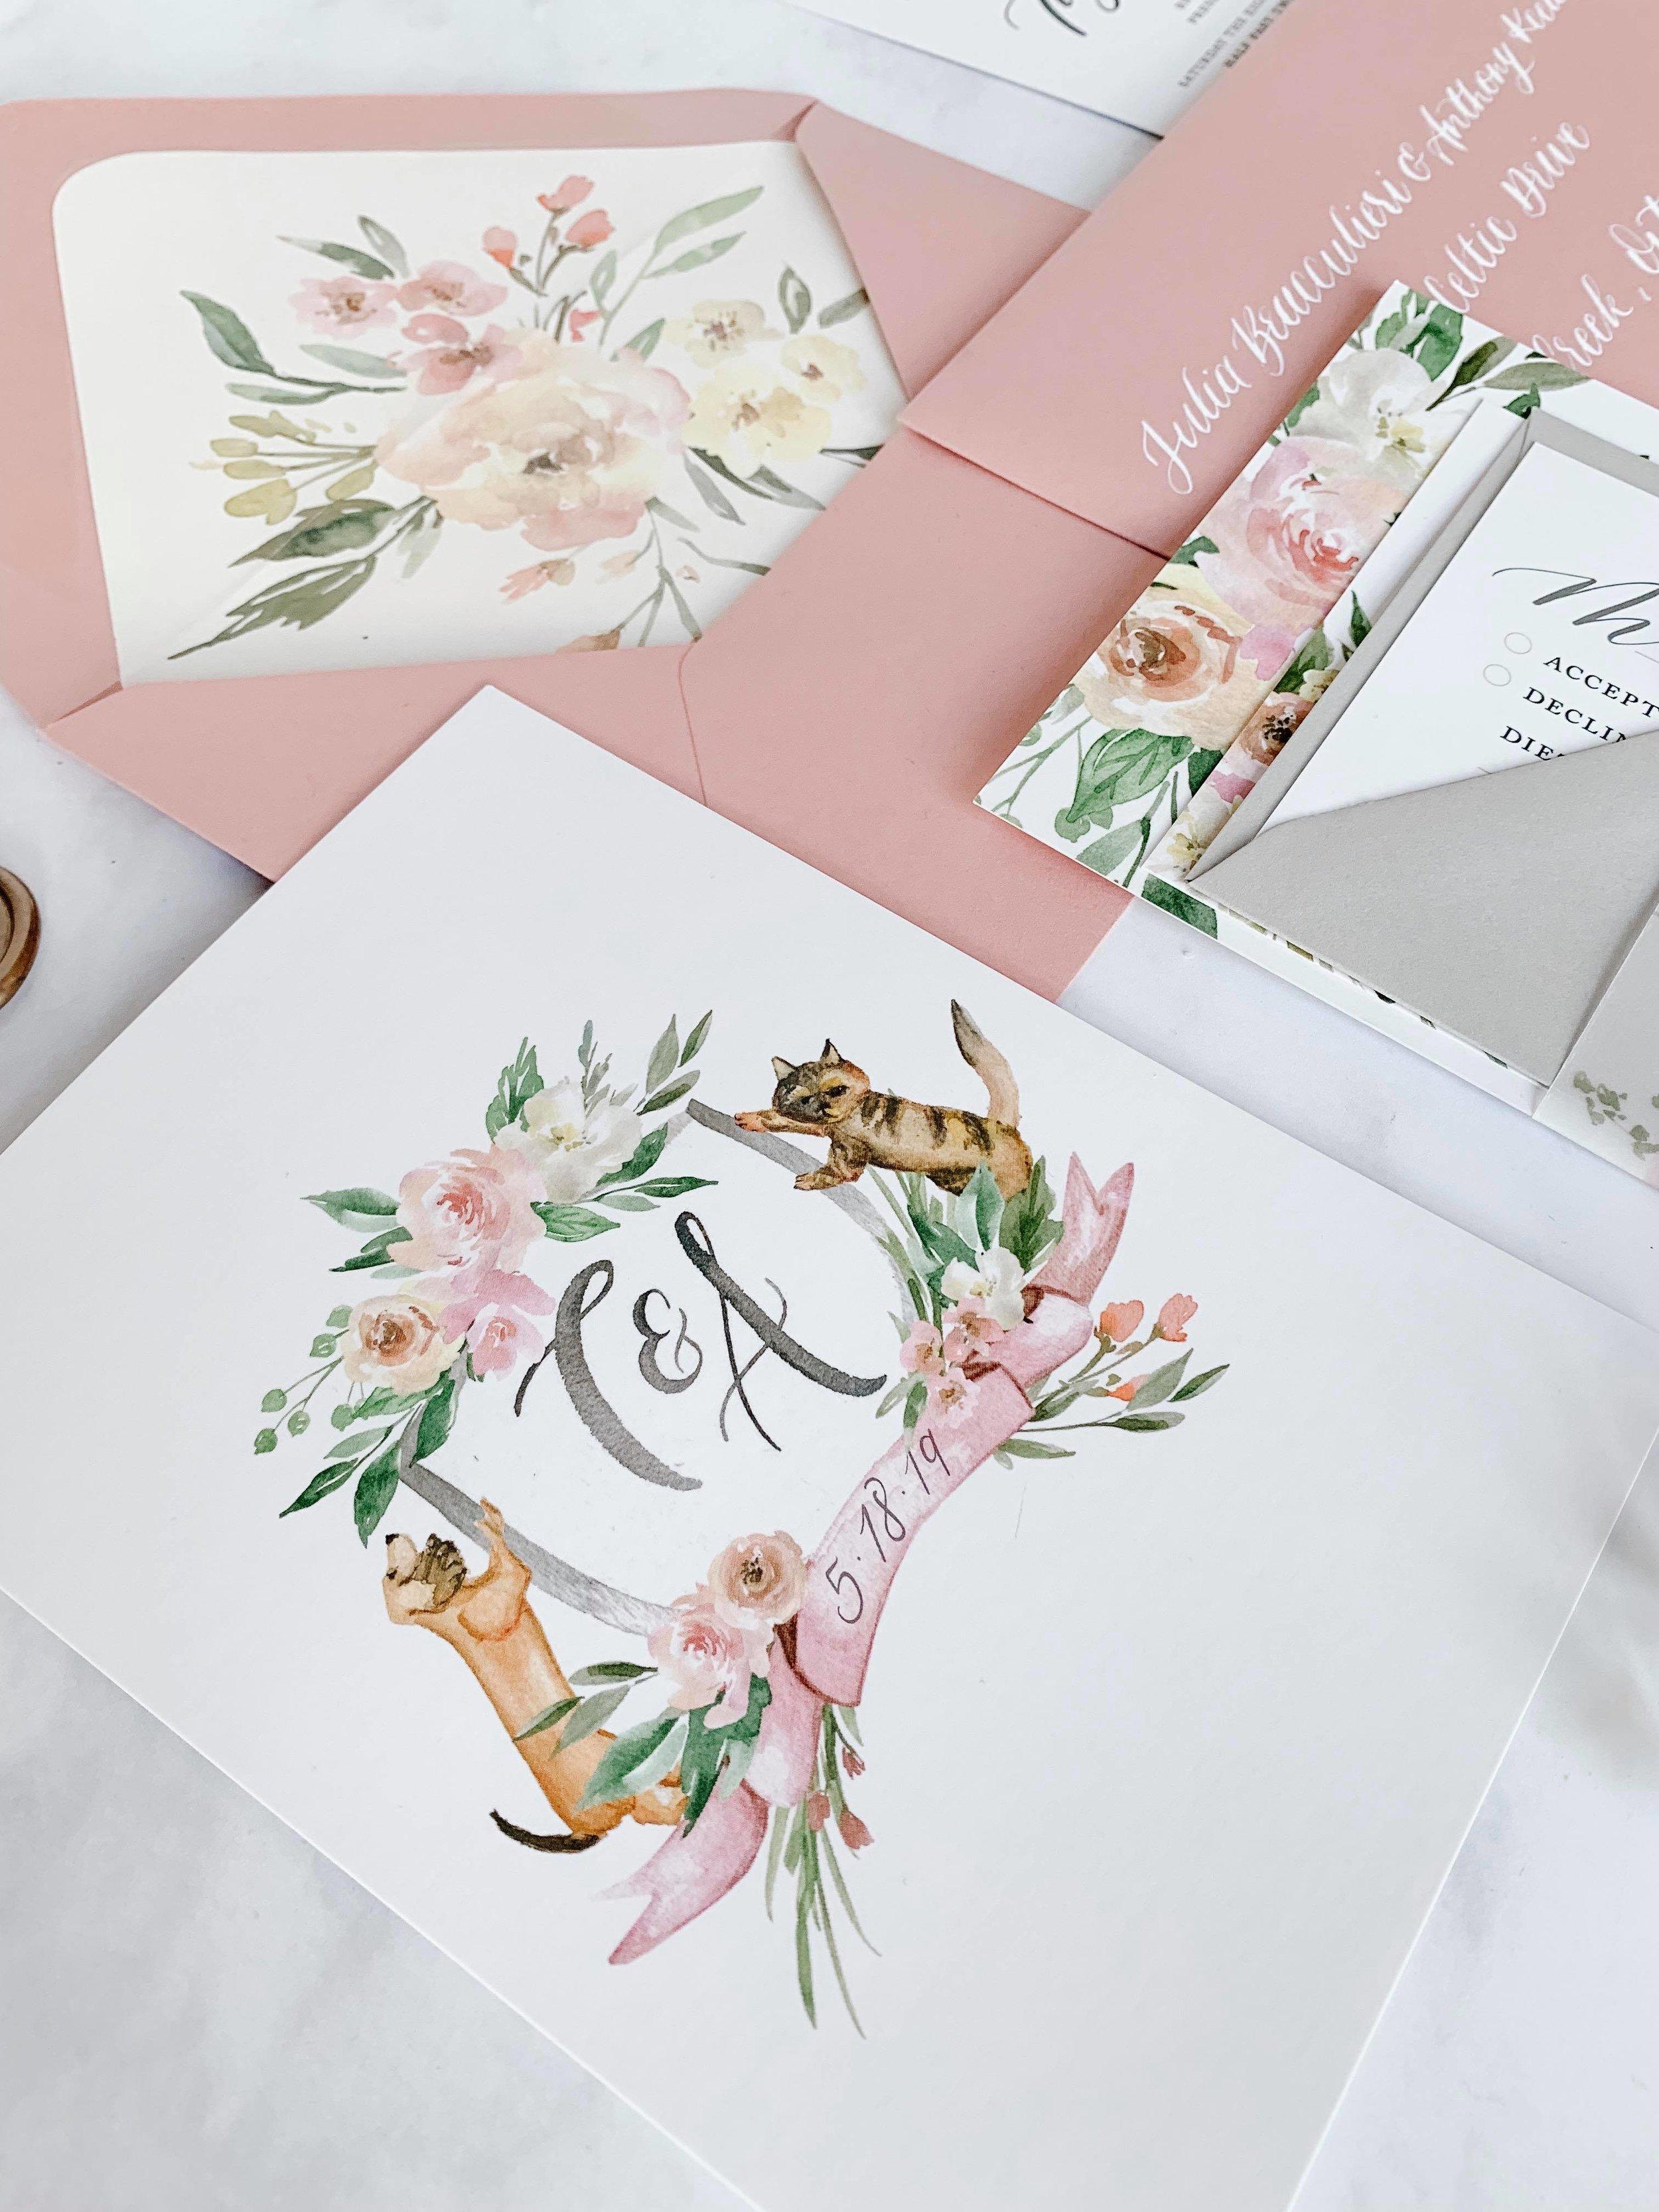 watercolour-monogram-wedding-crest-Tayne-and-ashley.jpg